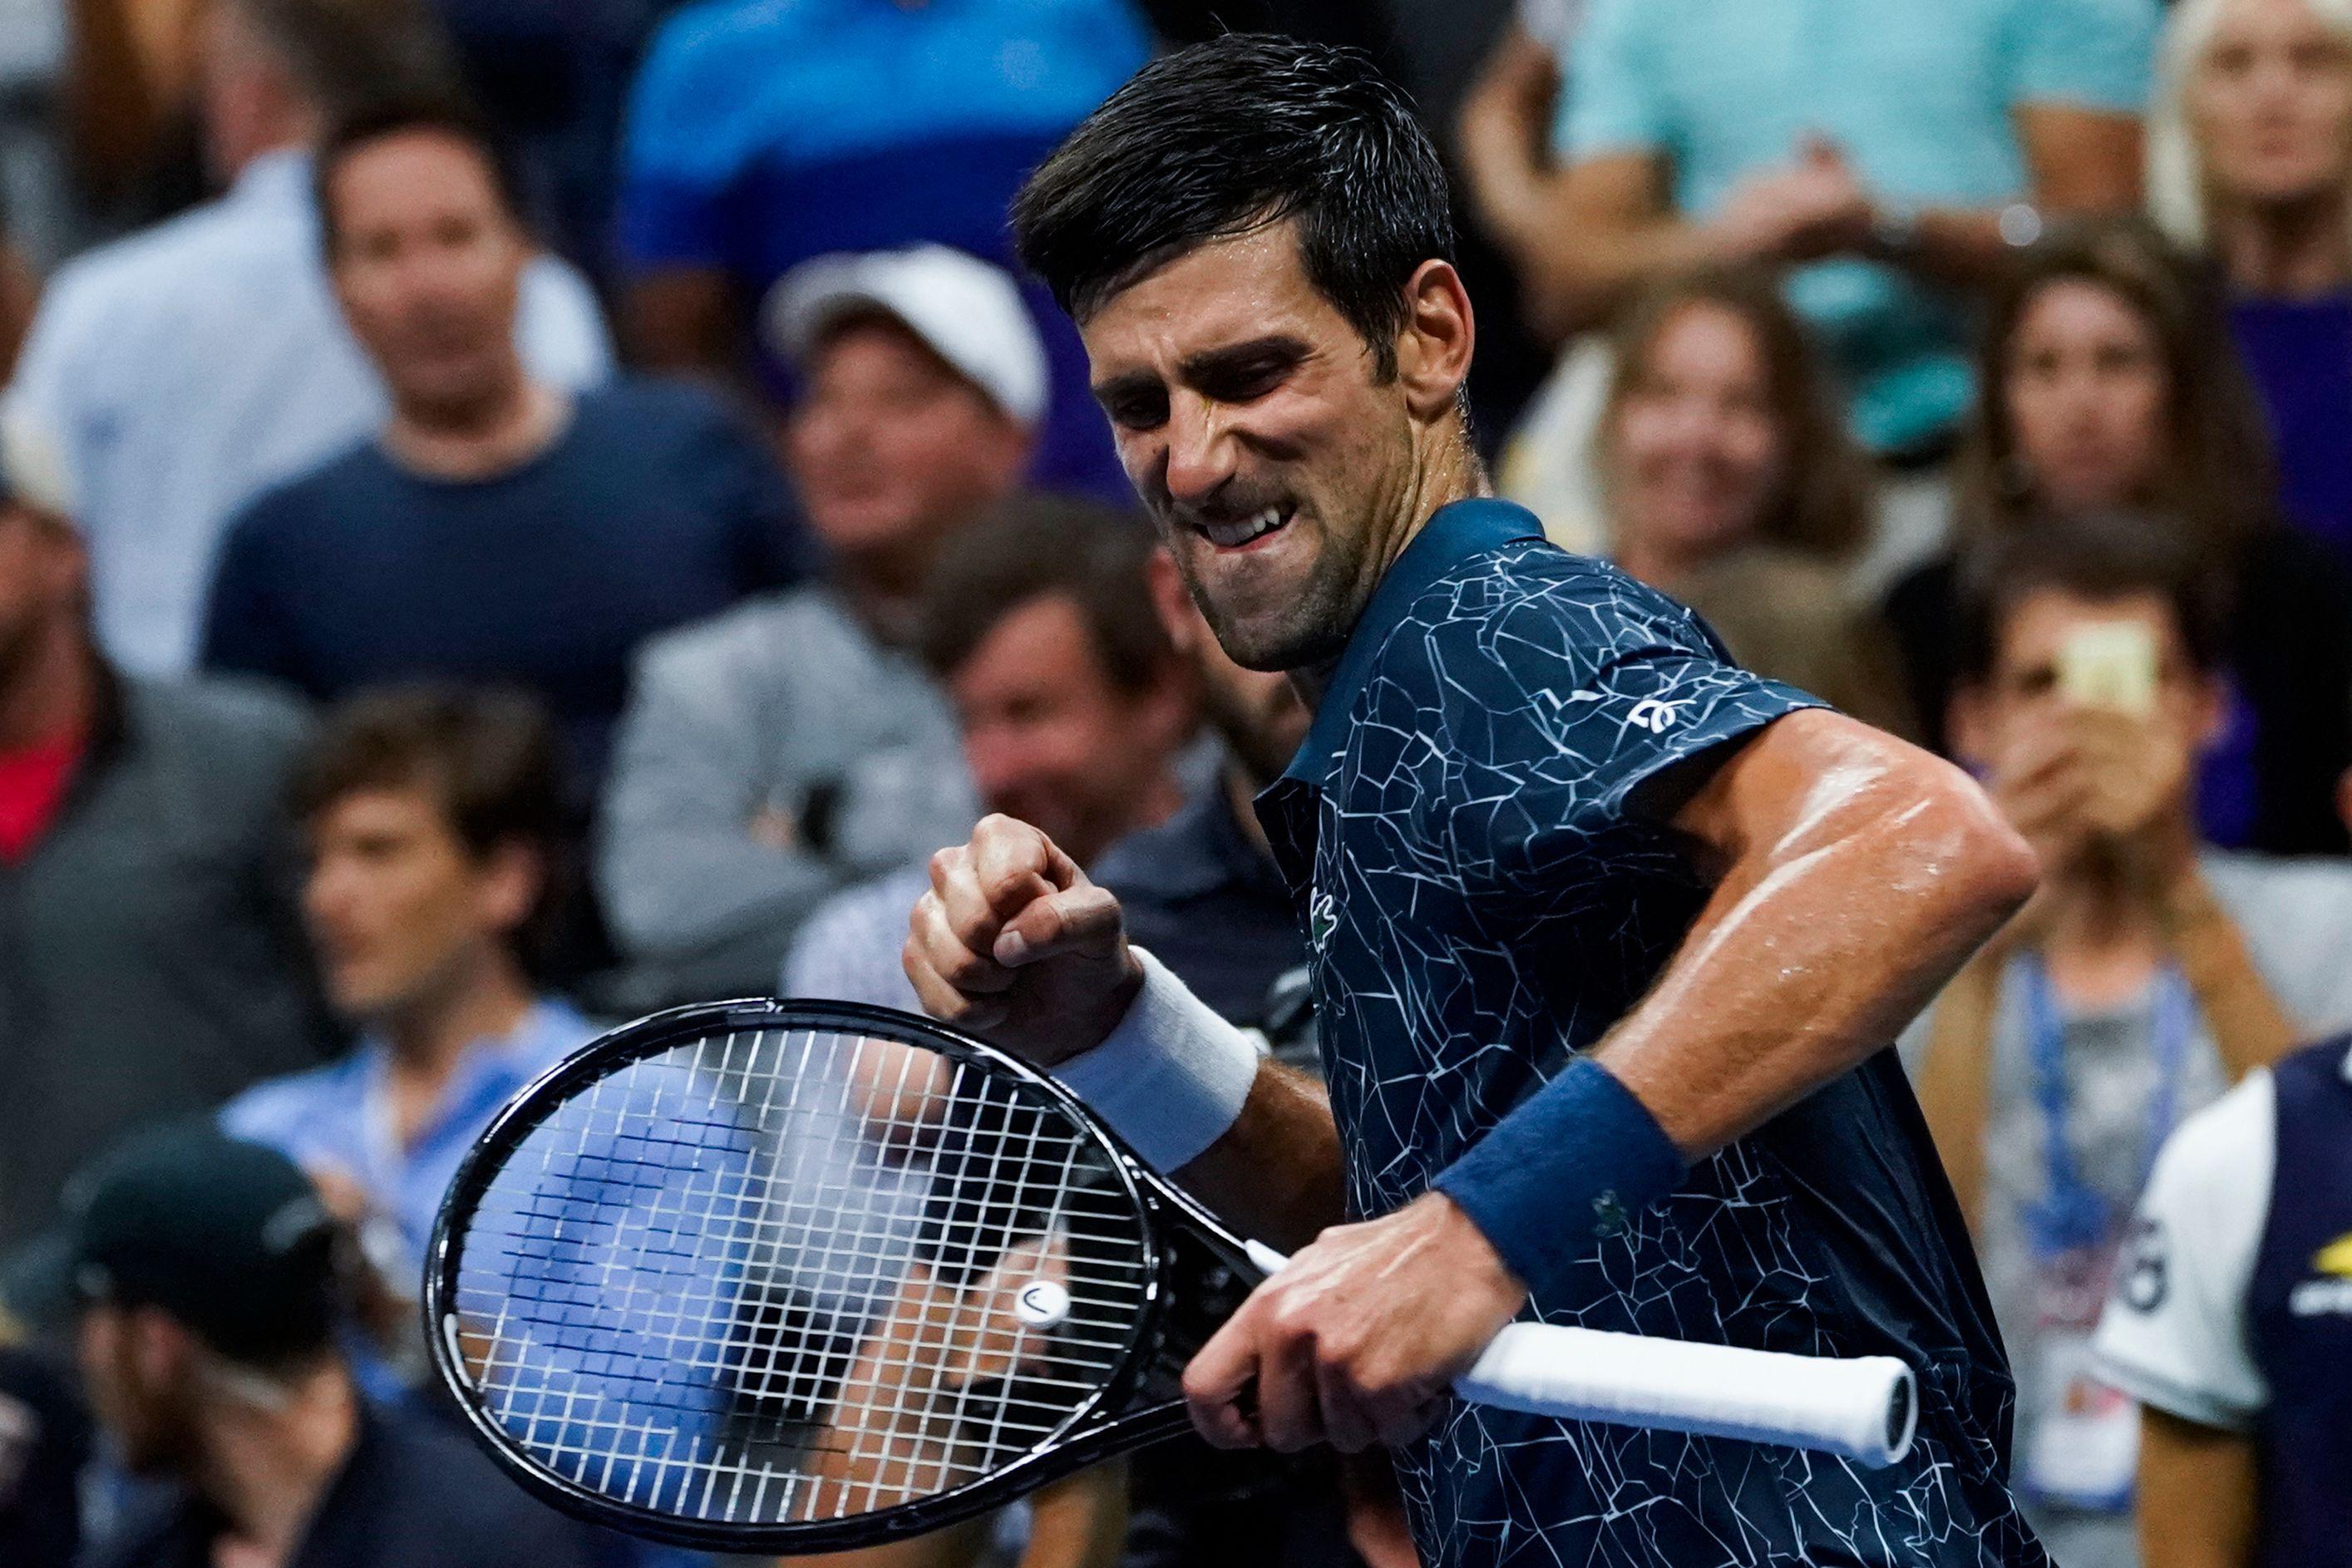 Novak Djokovic impressed in a straight sets victory over Richard Gasquet